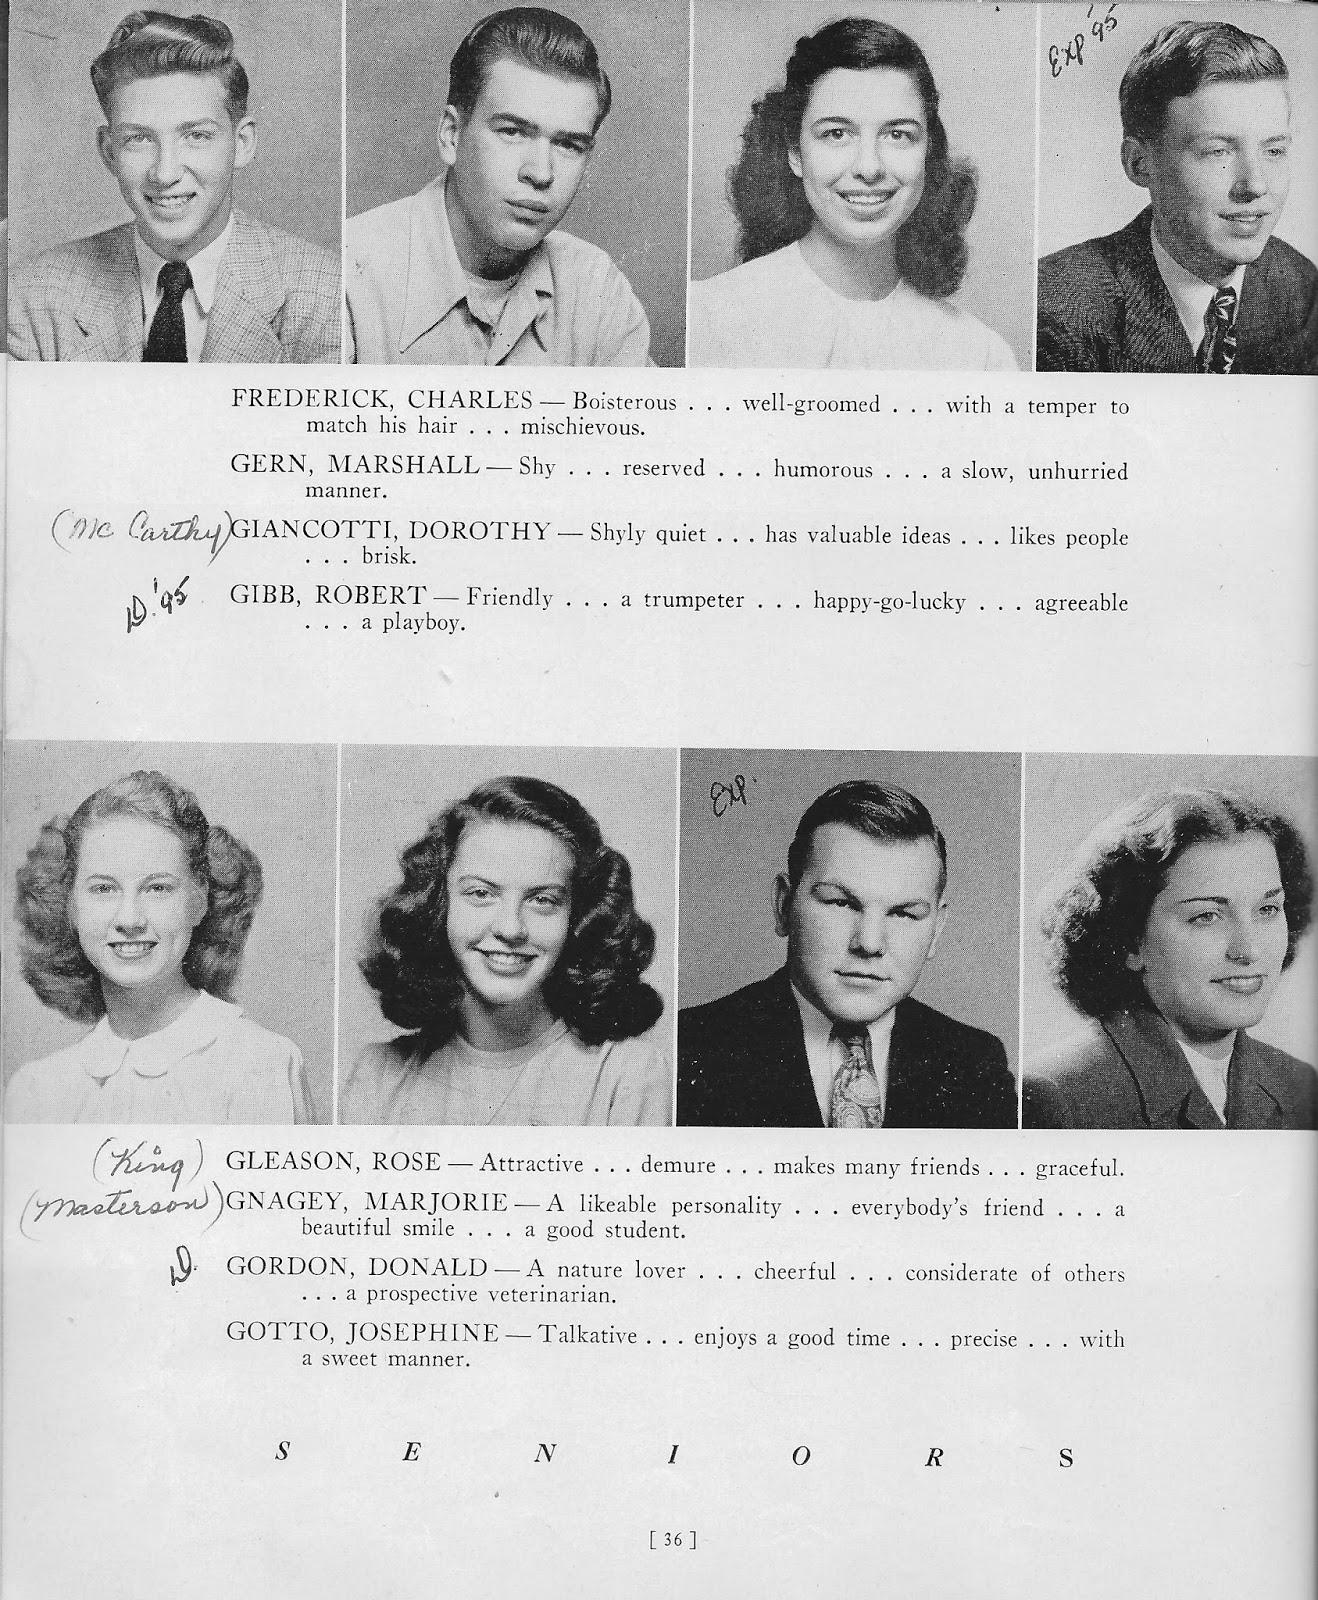 Retiring Guy's Digest: Rose Gleason King Font (1928-2016